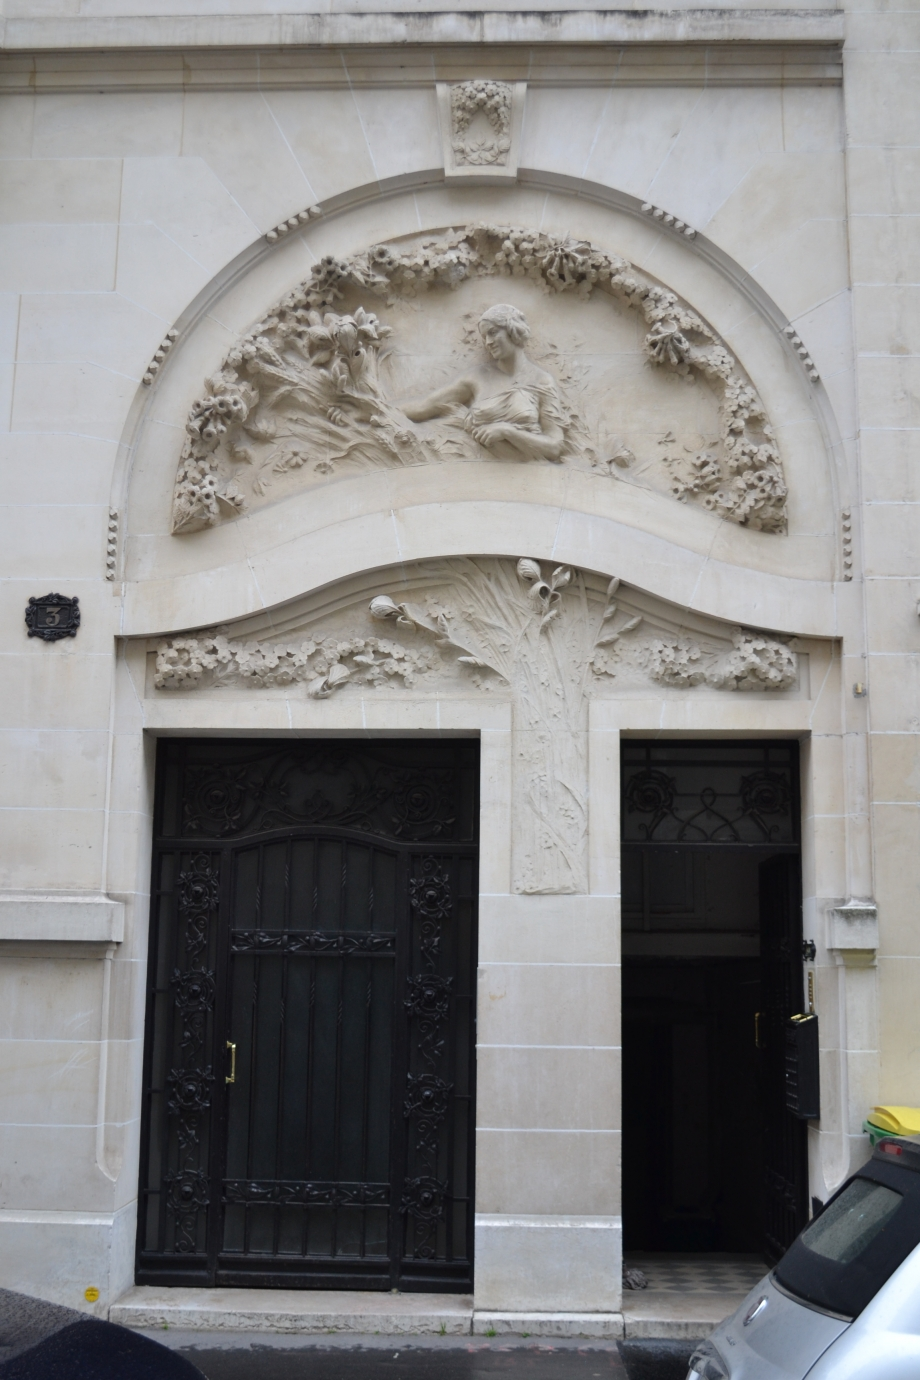 porte3-rue-alfred-dehodencq-paris-zigzag.jpg